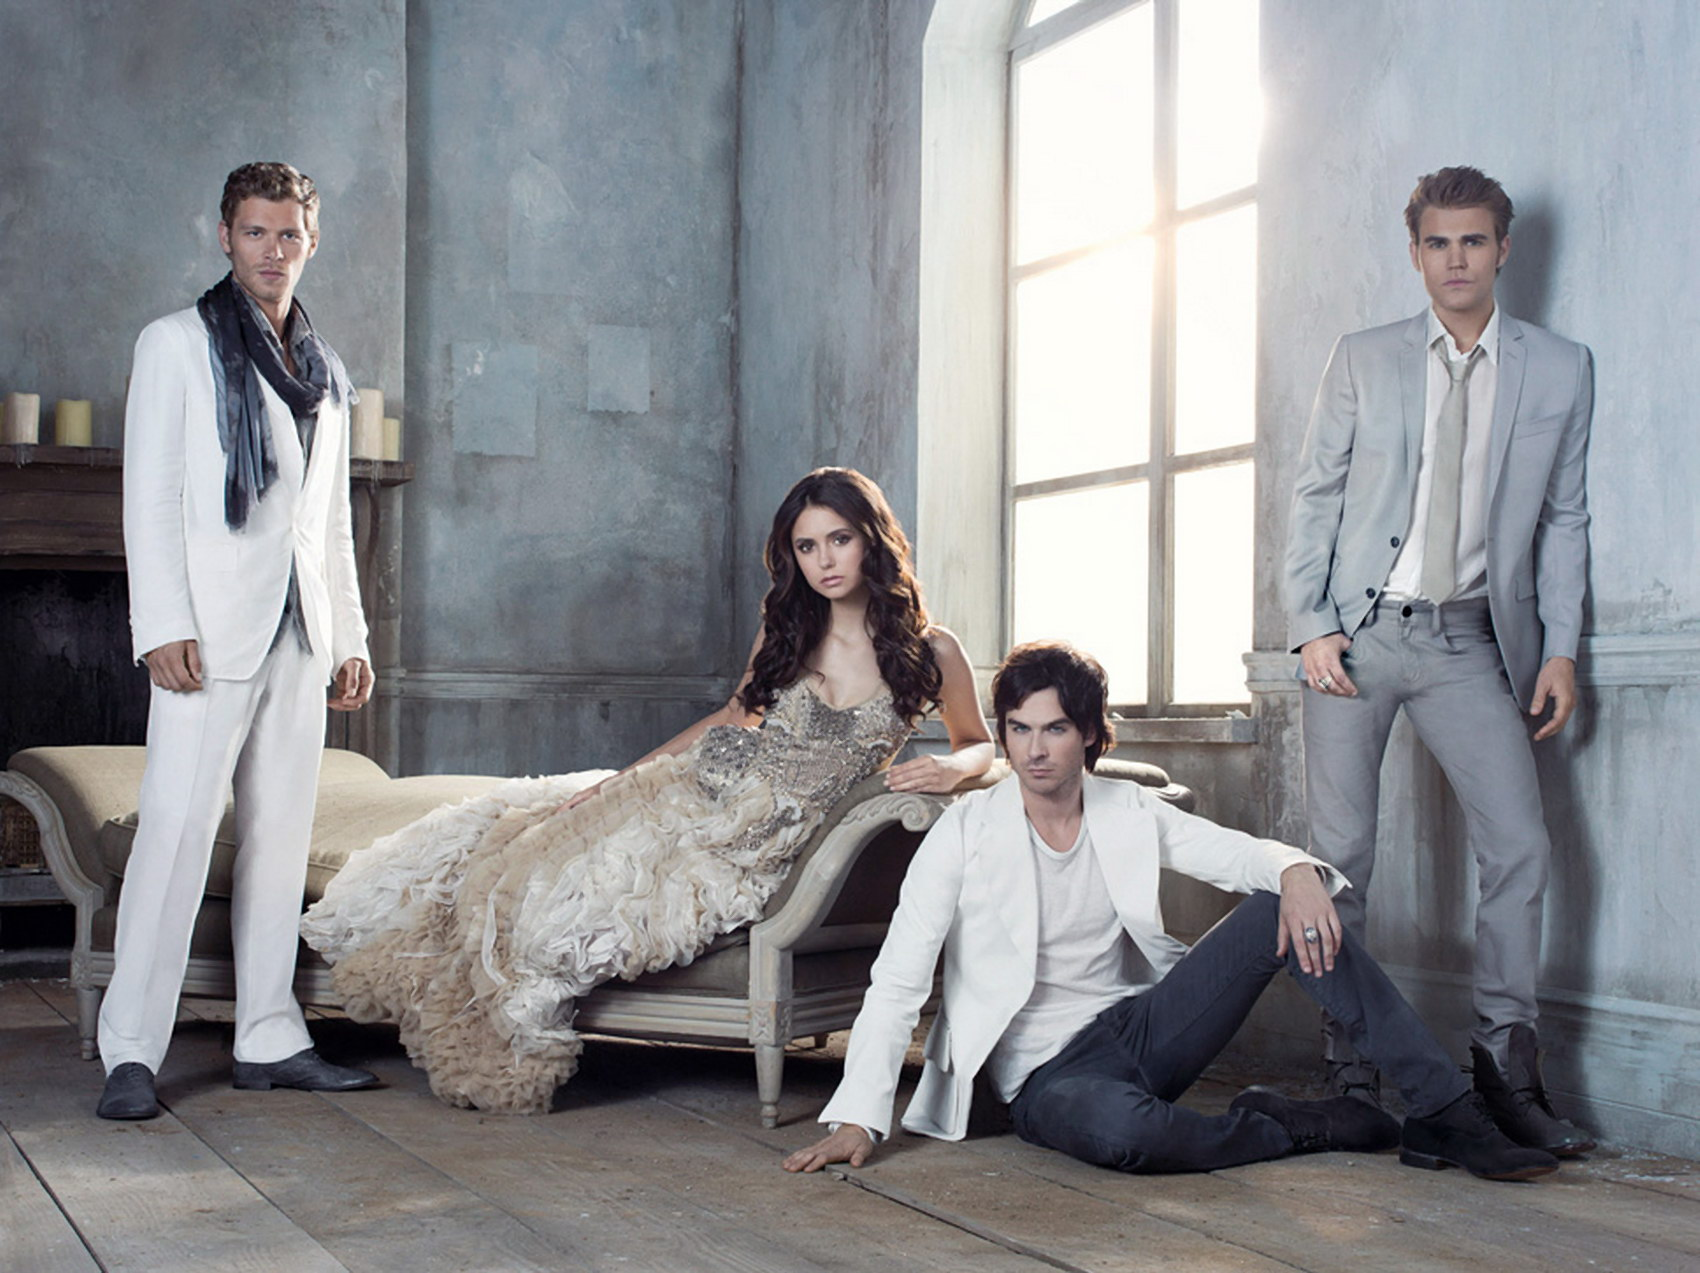 vampire diaries season 4 episode 16 review